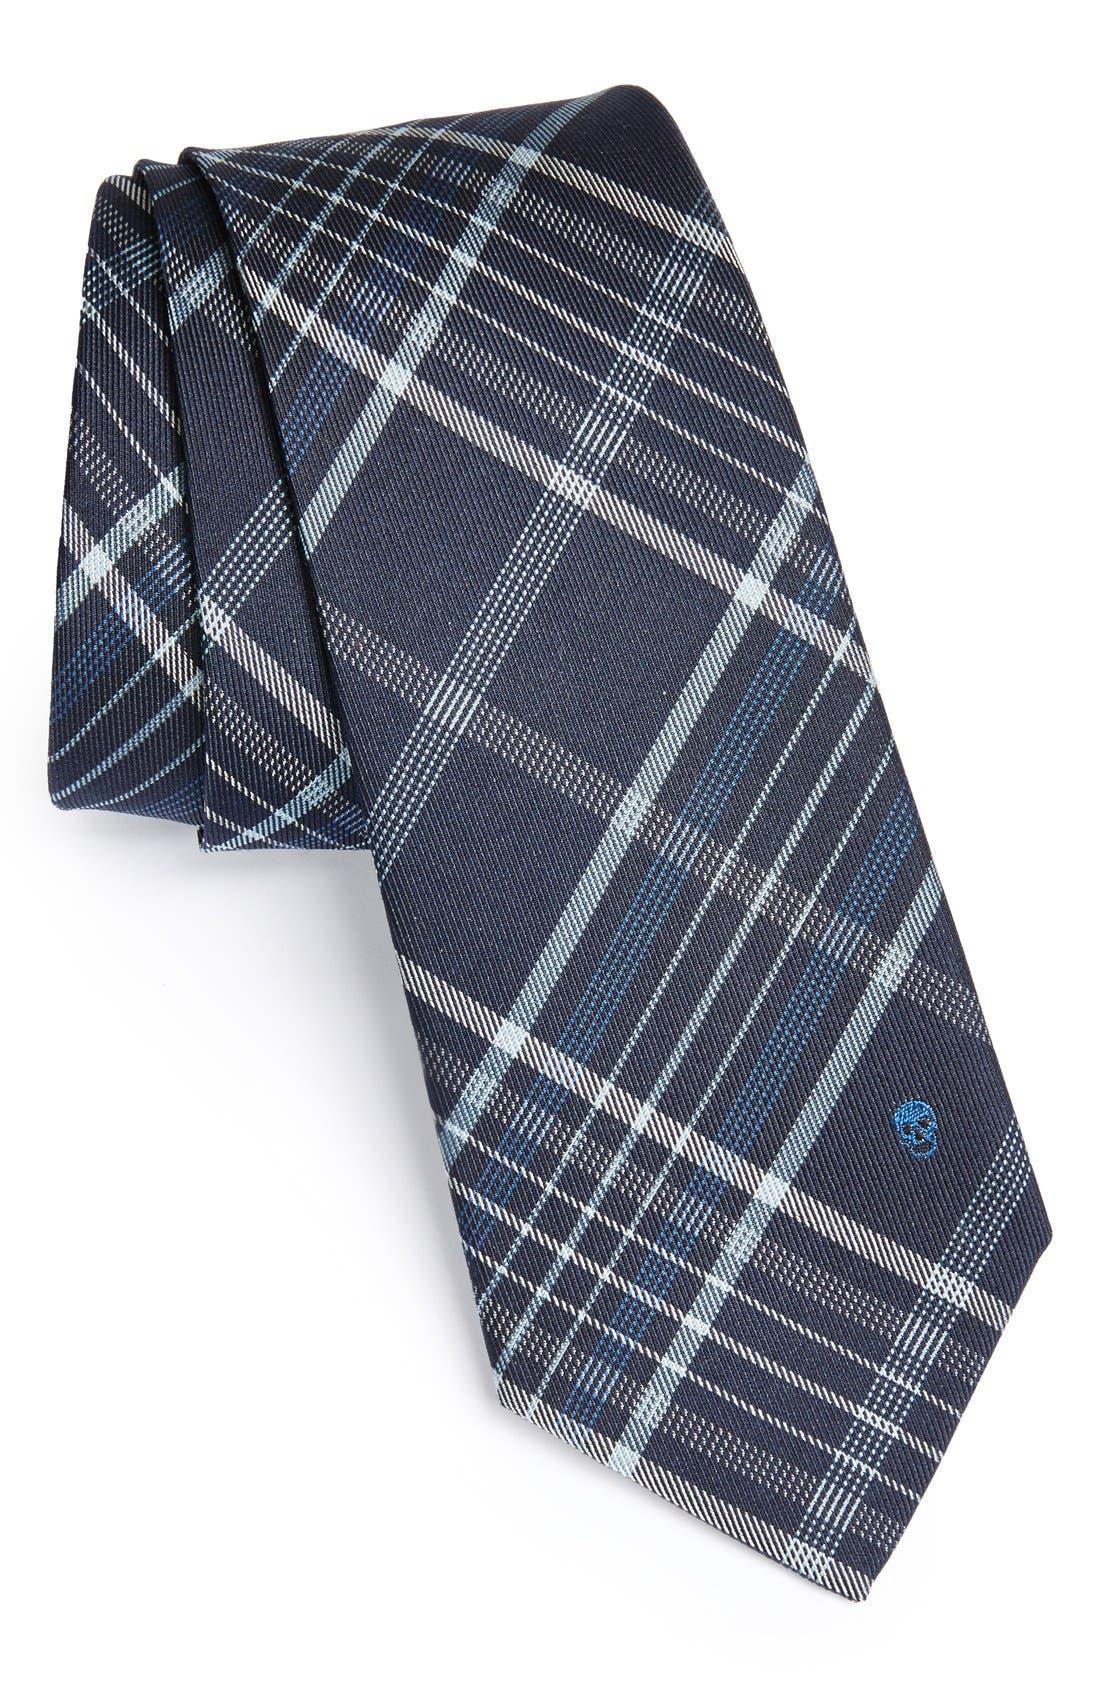 Main Image - Alexander McQueen Woven Silk & Cotton Tie